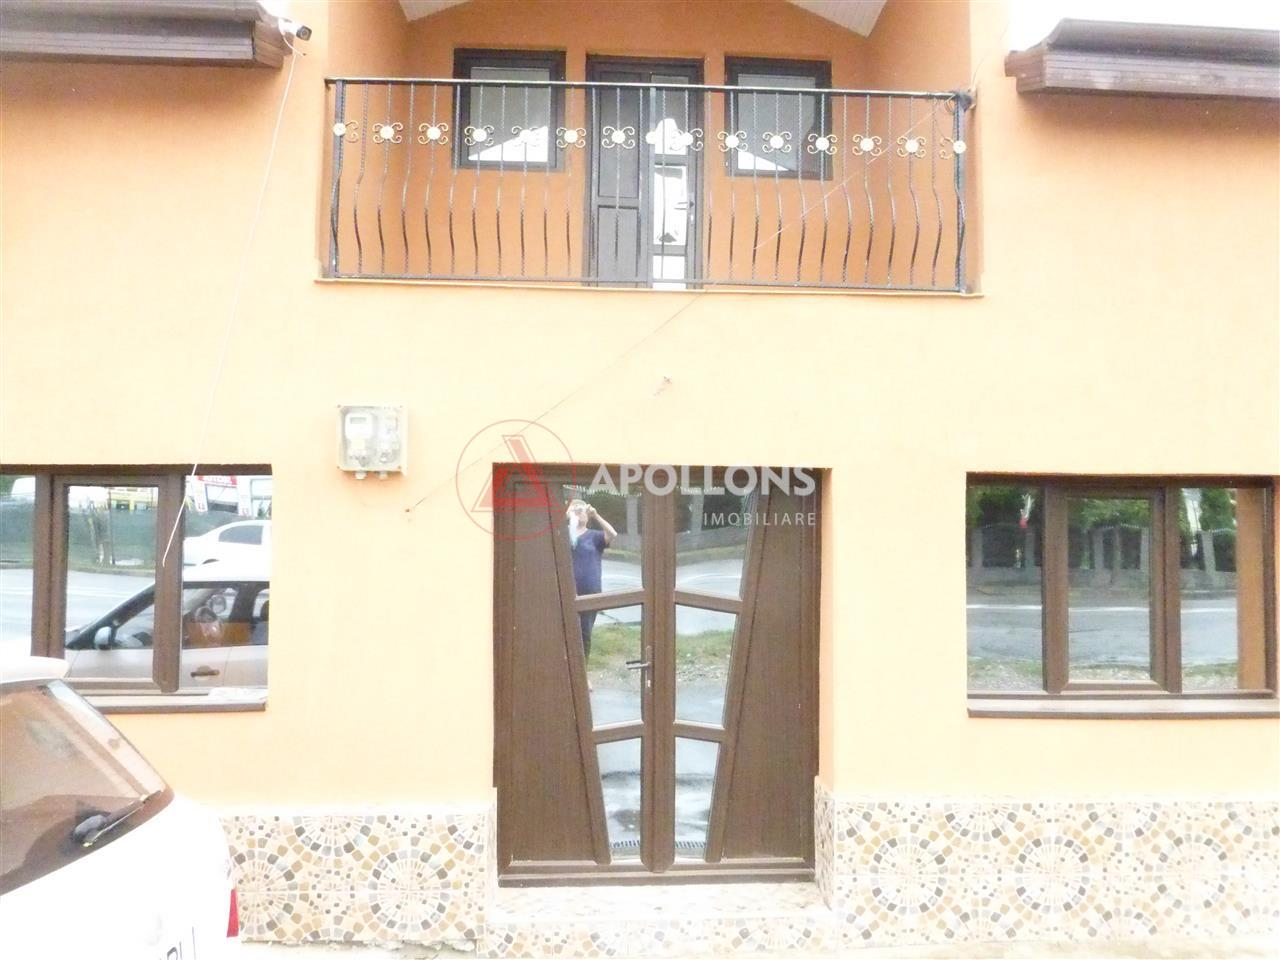 Inchiriere Spatii de birouri Serbanesti, Bacau